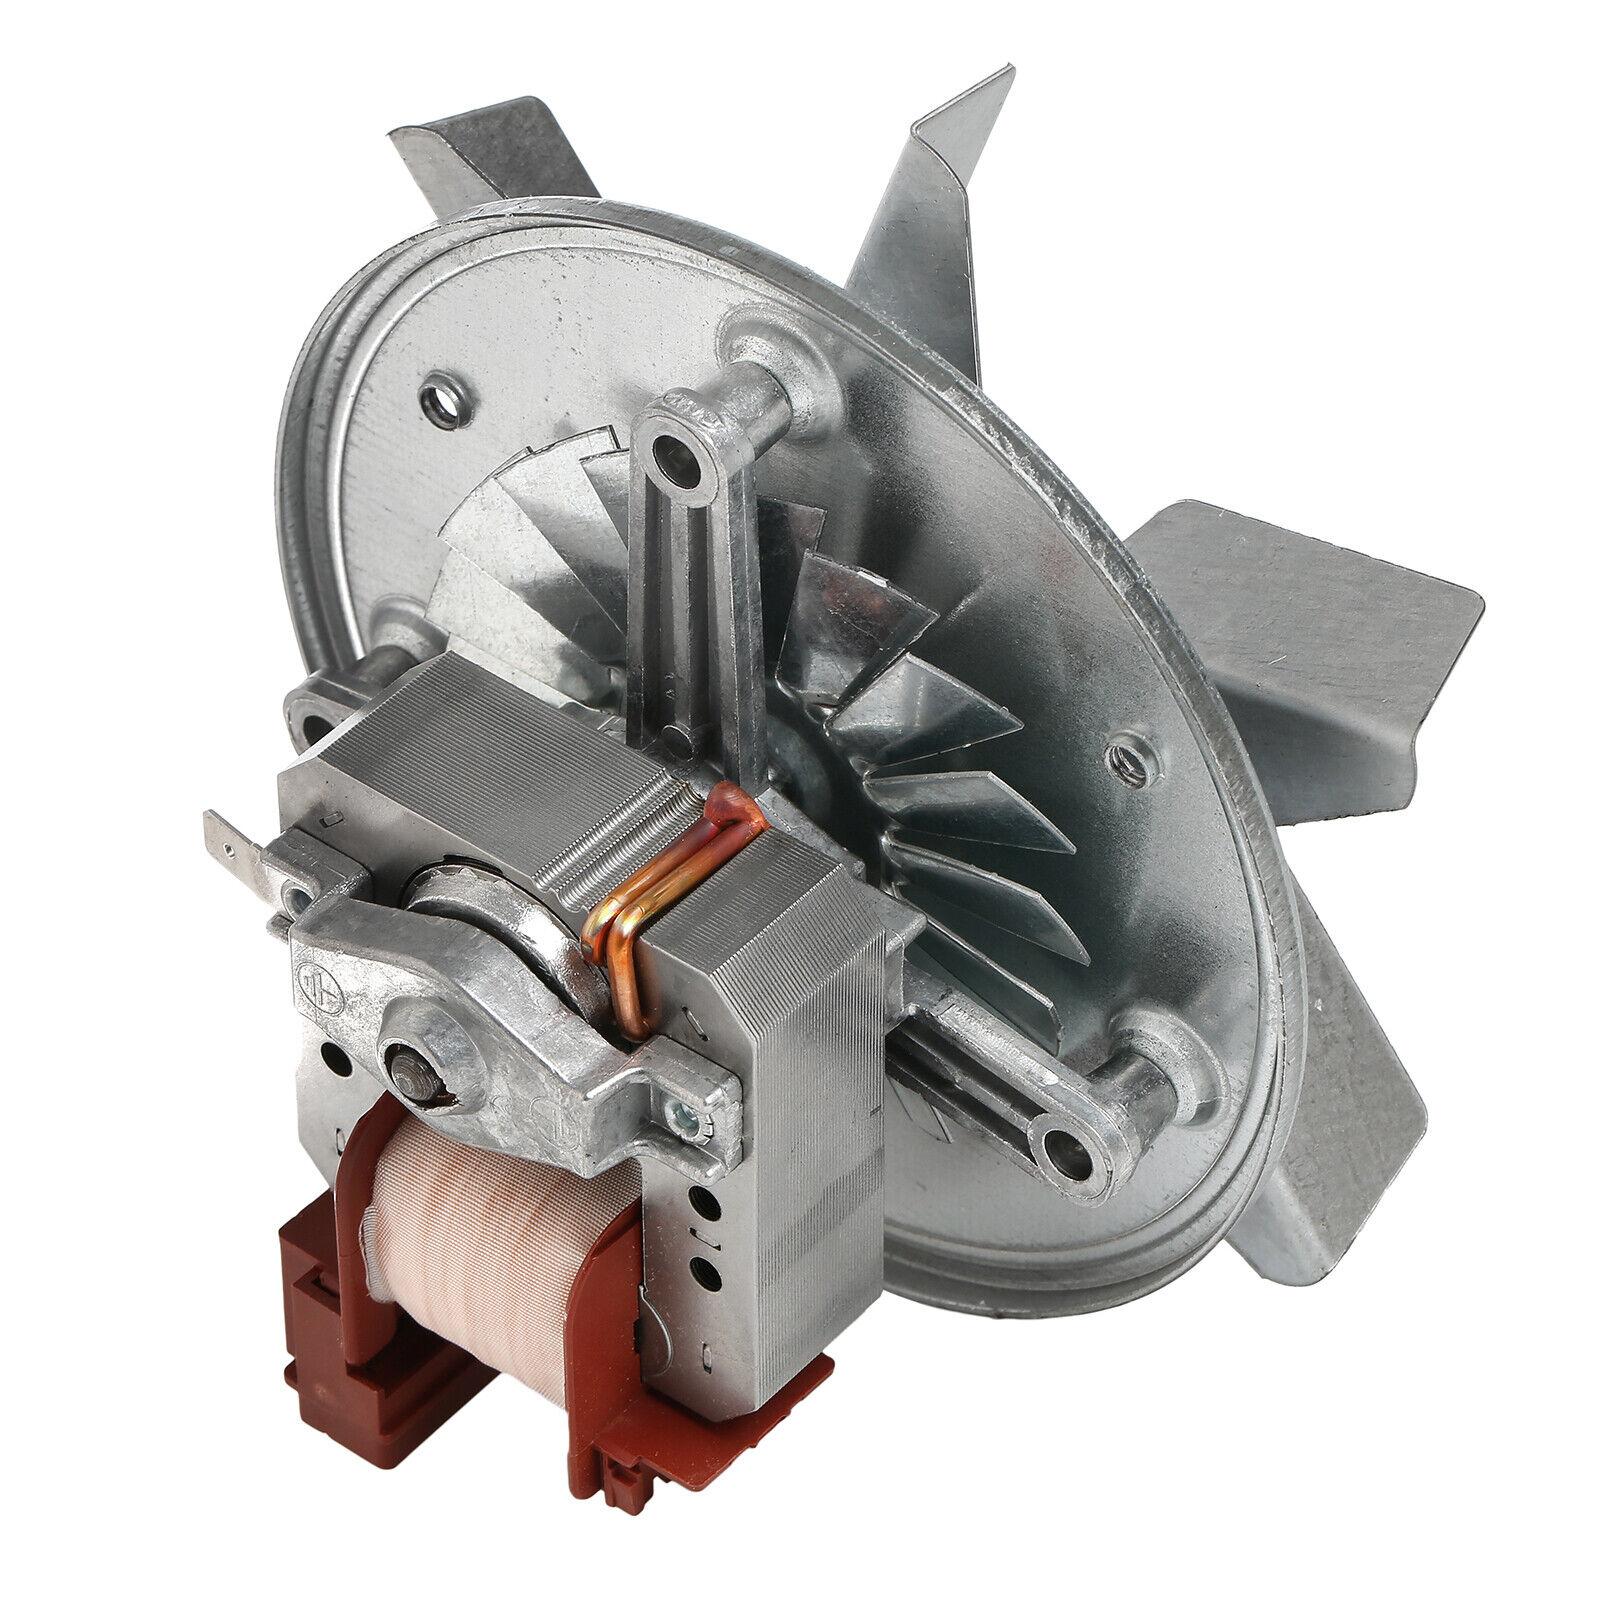 T FID20BK INDESIT fornello ventola forno Element FDU20IX fdu20wh FID20BK FID20BK T